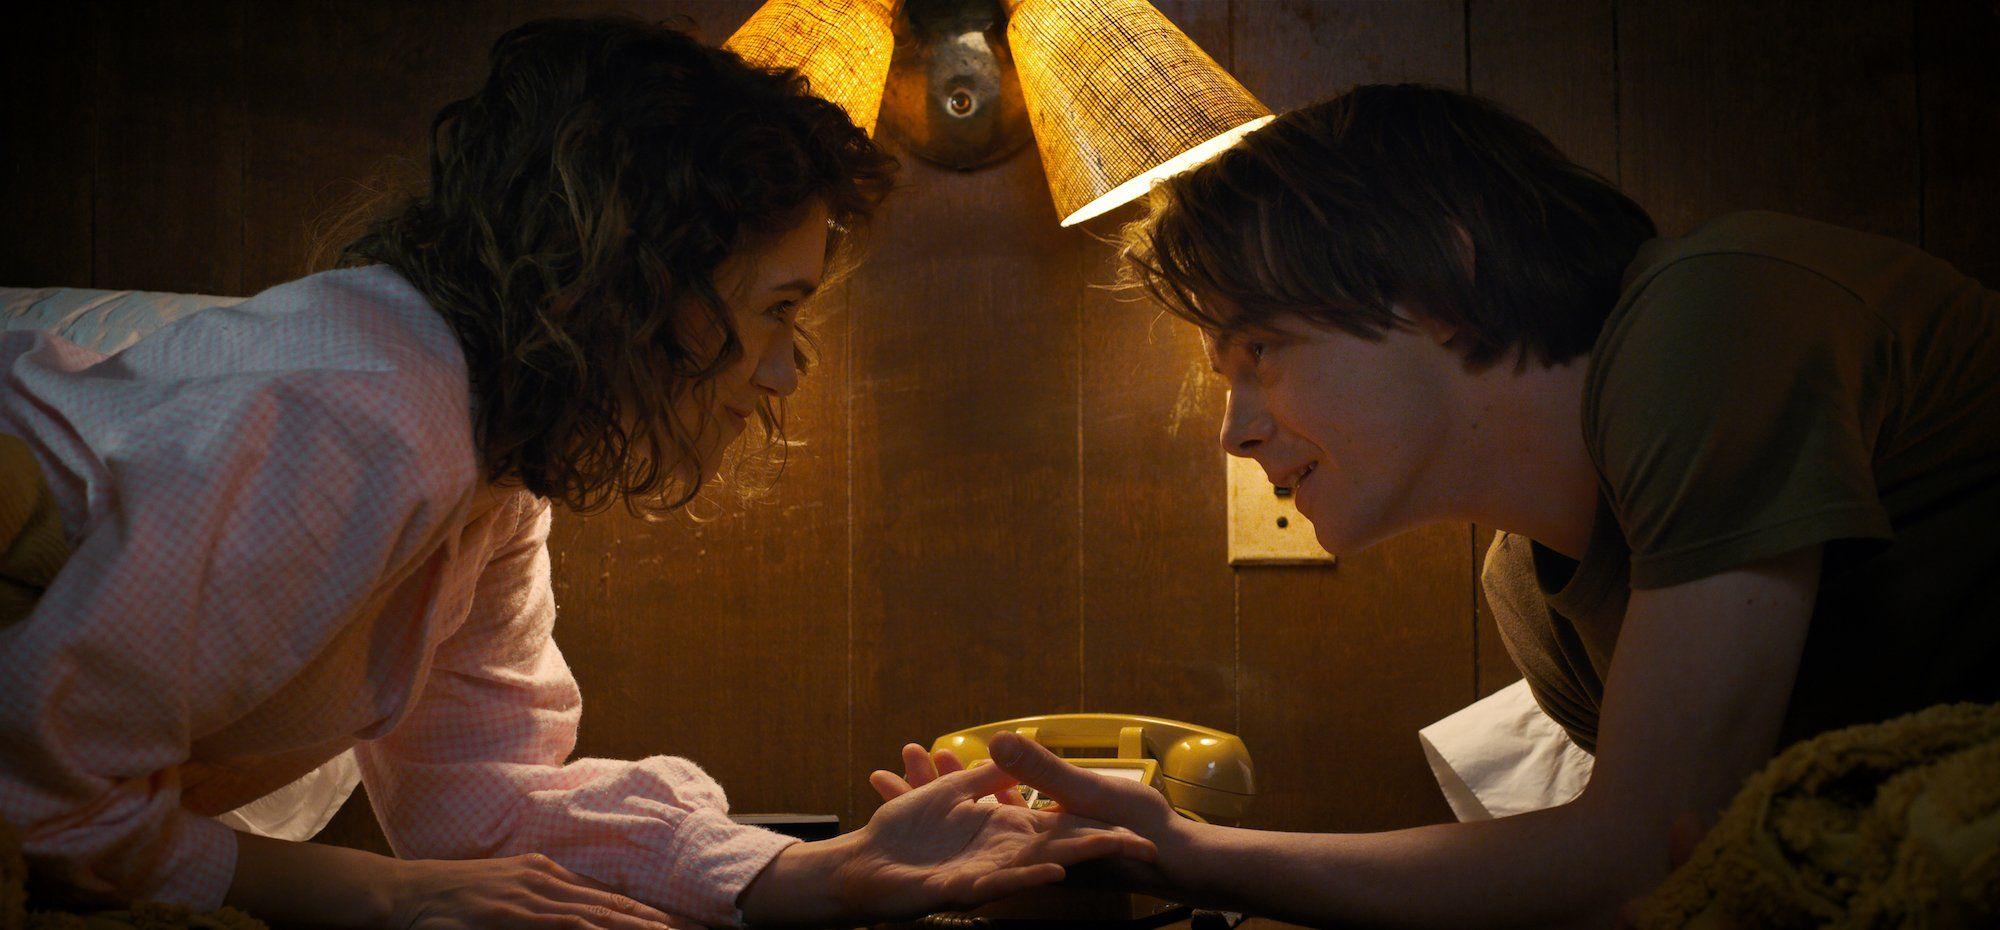 Natalia Dyer as Nancy Wheeler and Charlie Heaton as Jonathan Byers on Stranger Things 2